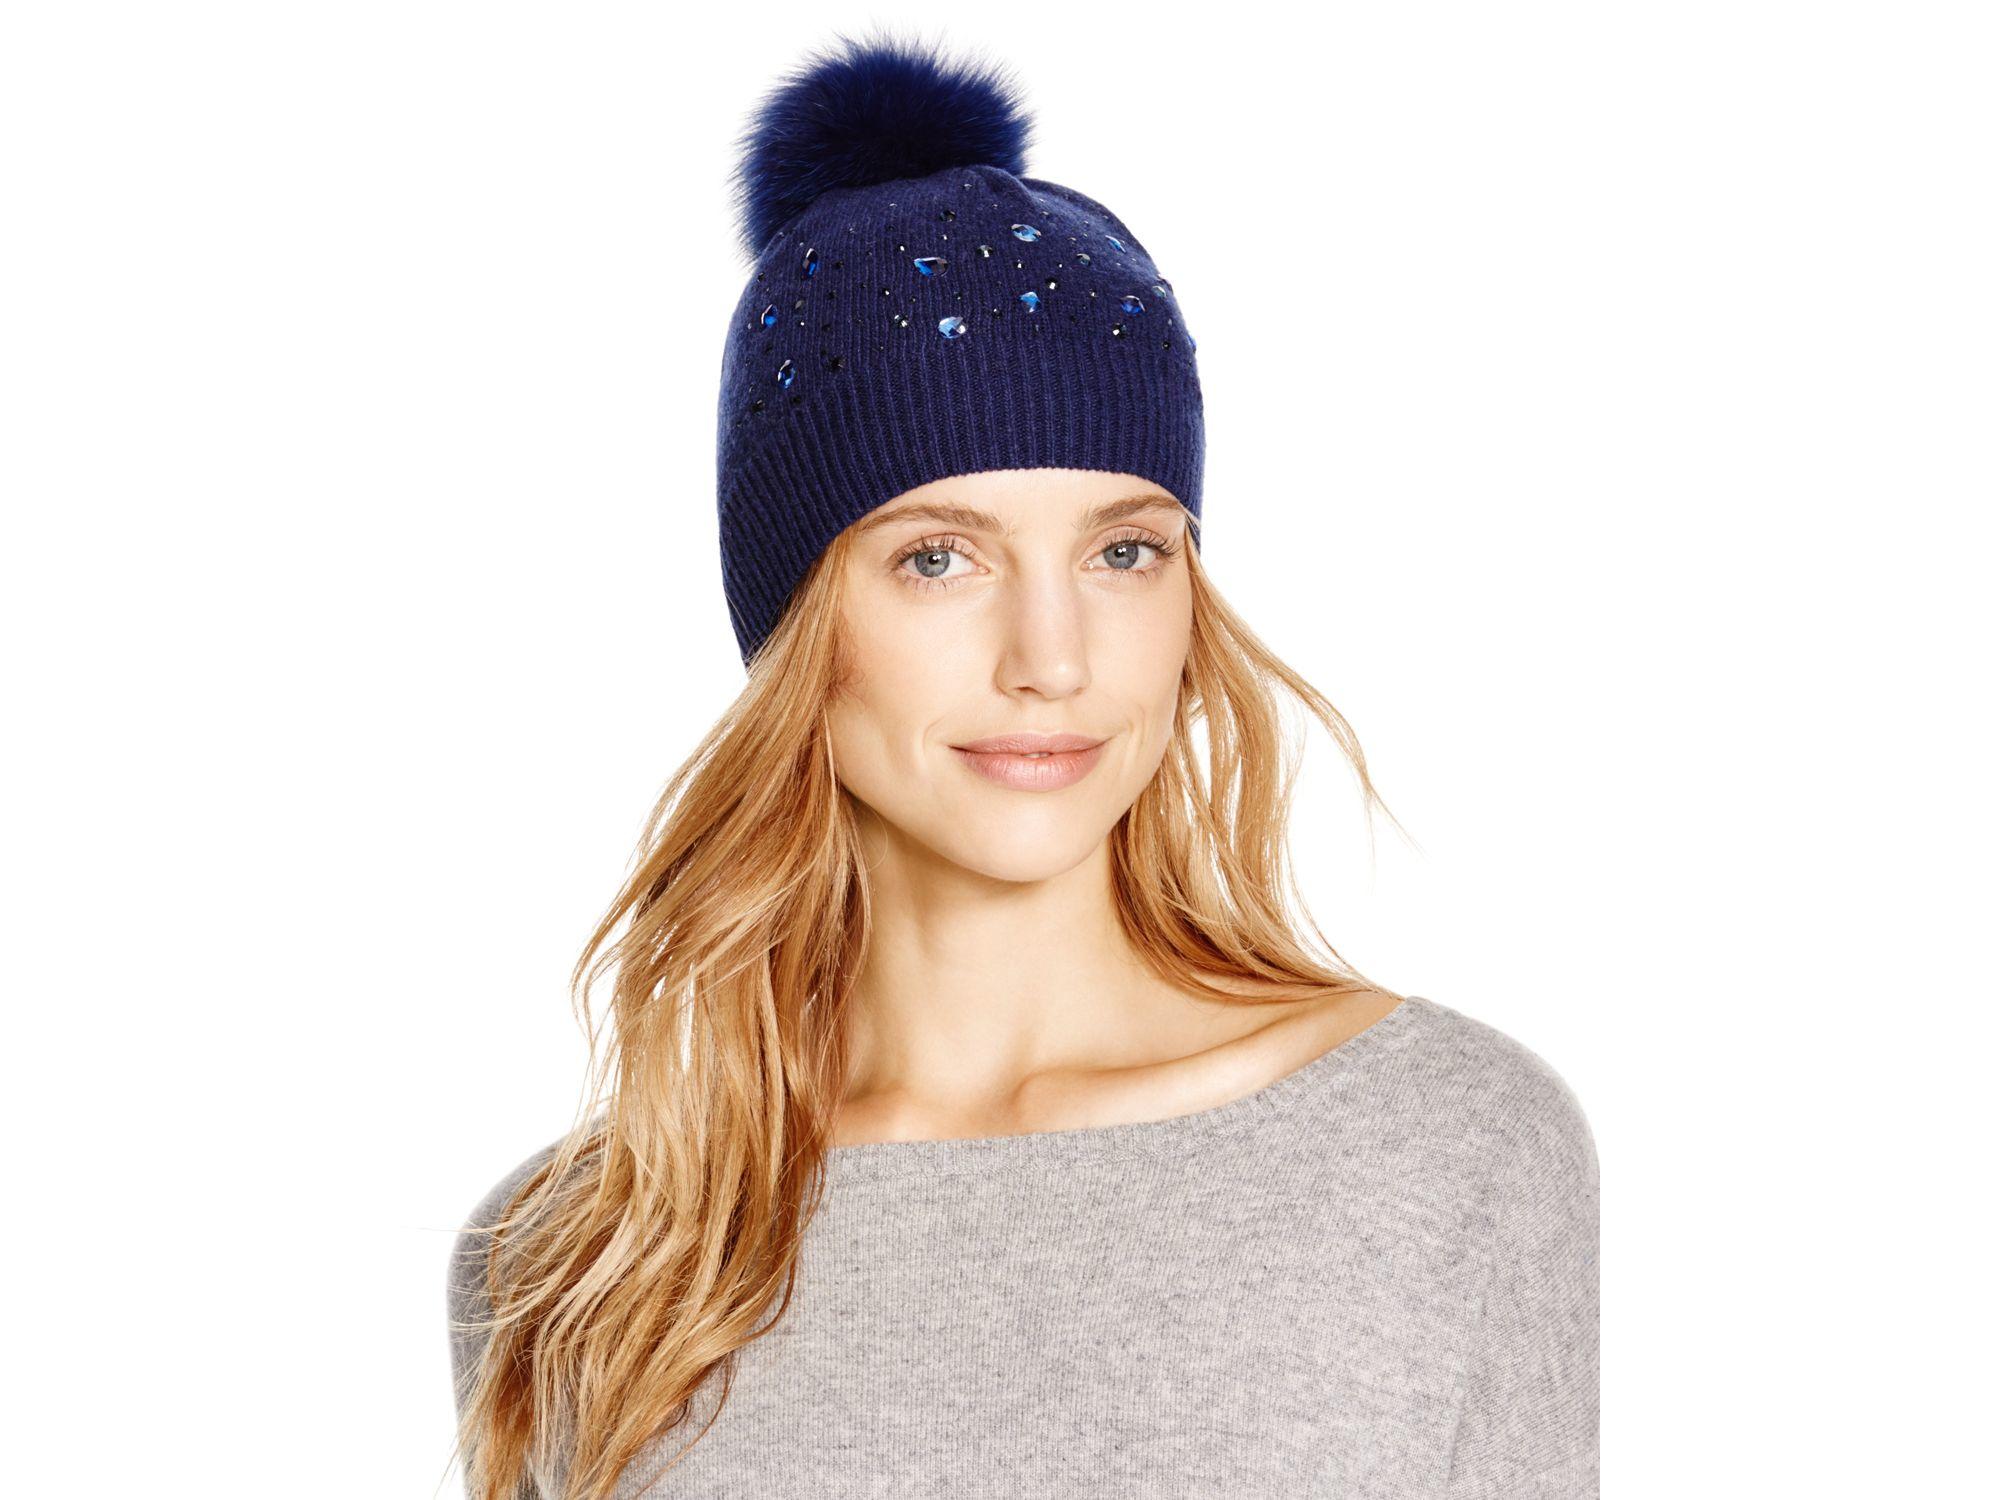 6bb7fc4dc99 Lyst - Aqua Beaded Slouchy Hat With Fox Fur Pom-pom in Blue